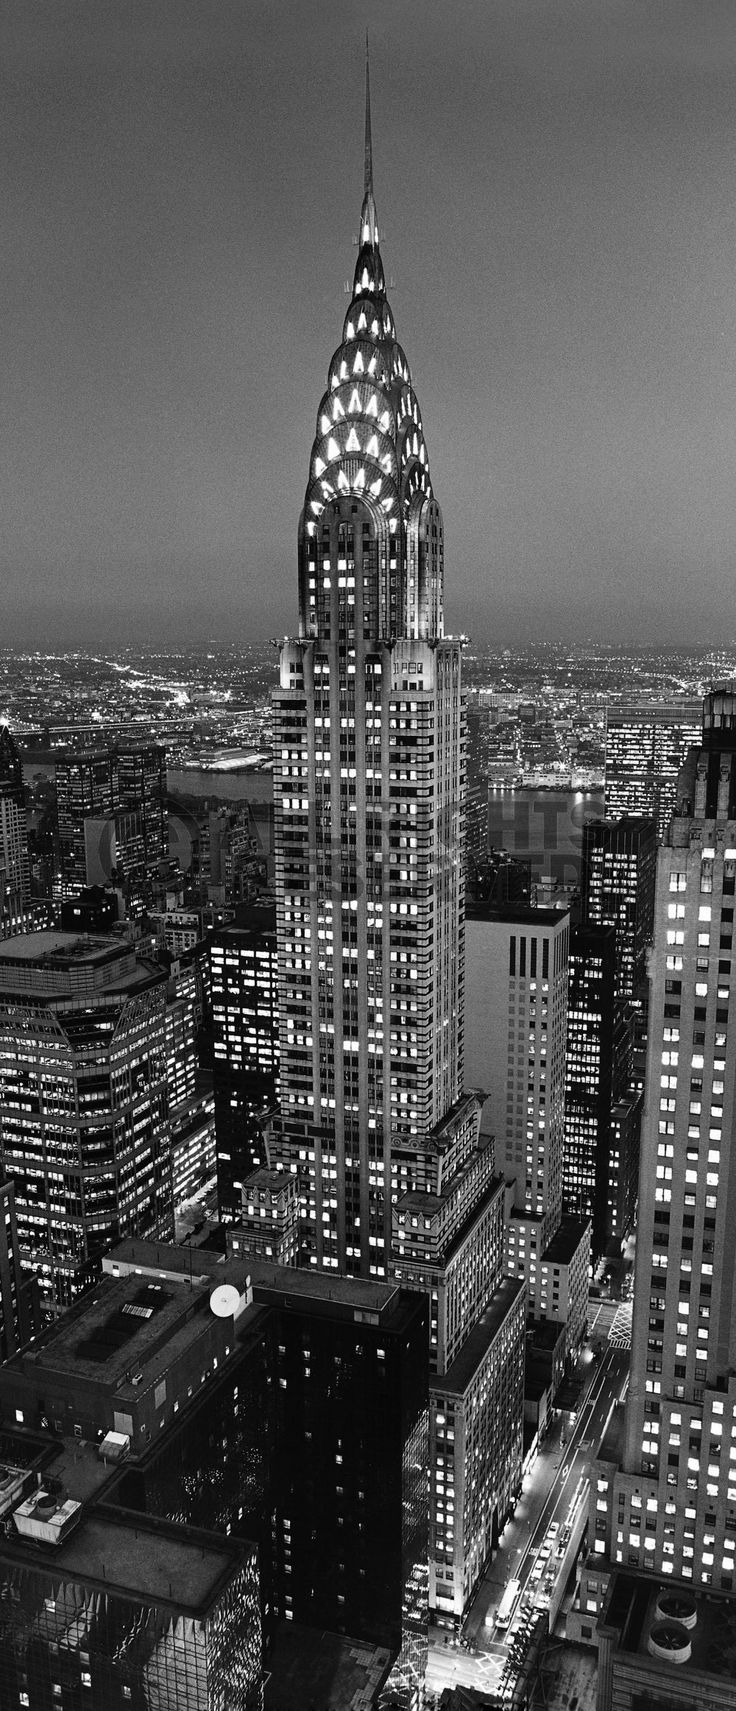 Крайслер Билдинг (Chrysler Building) ... Подробнее - http://issuu.com/a.city/docs/specialized_magazine_a.city___4/33